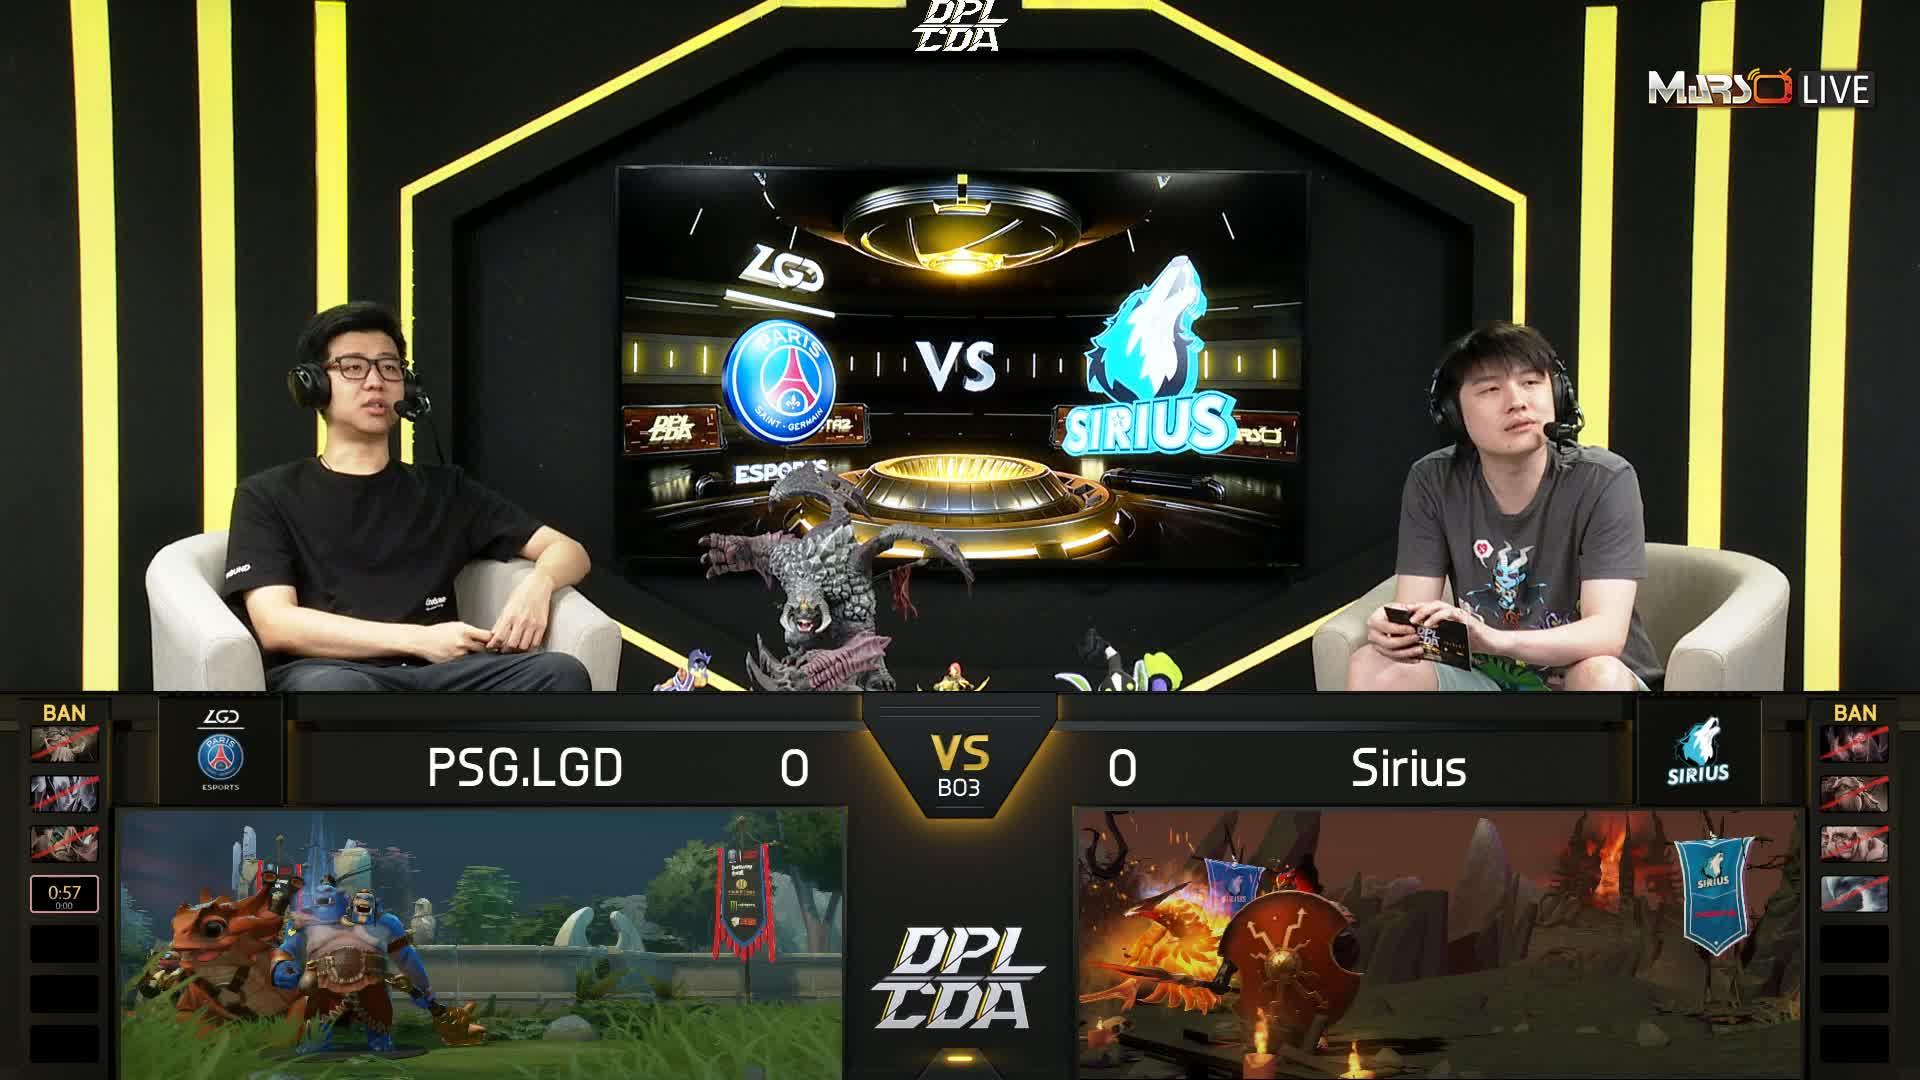 常规赛 PSG.LGD vs Sirius - 1